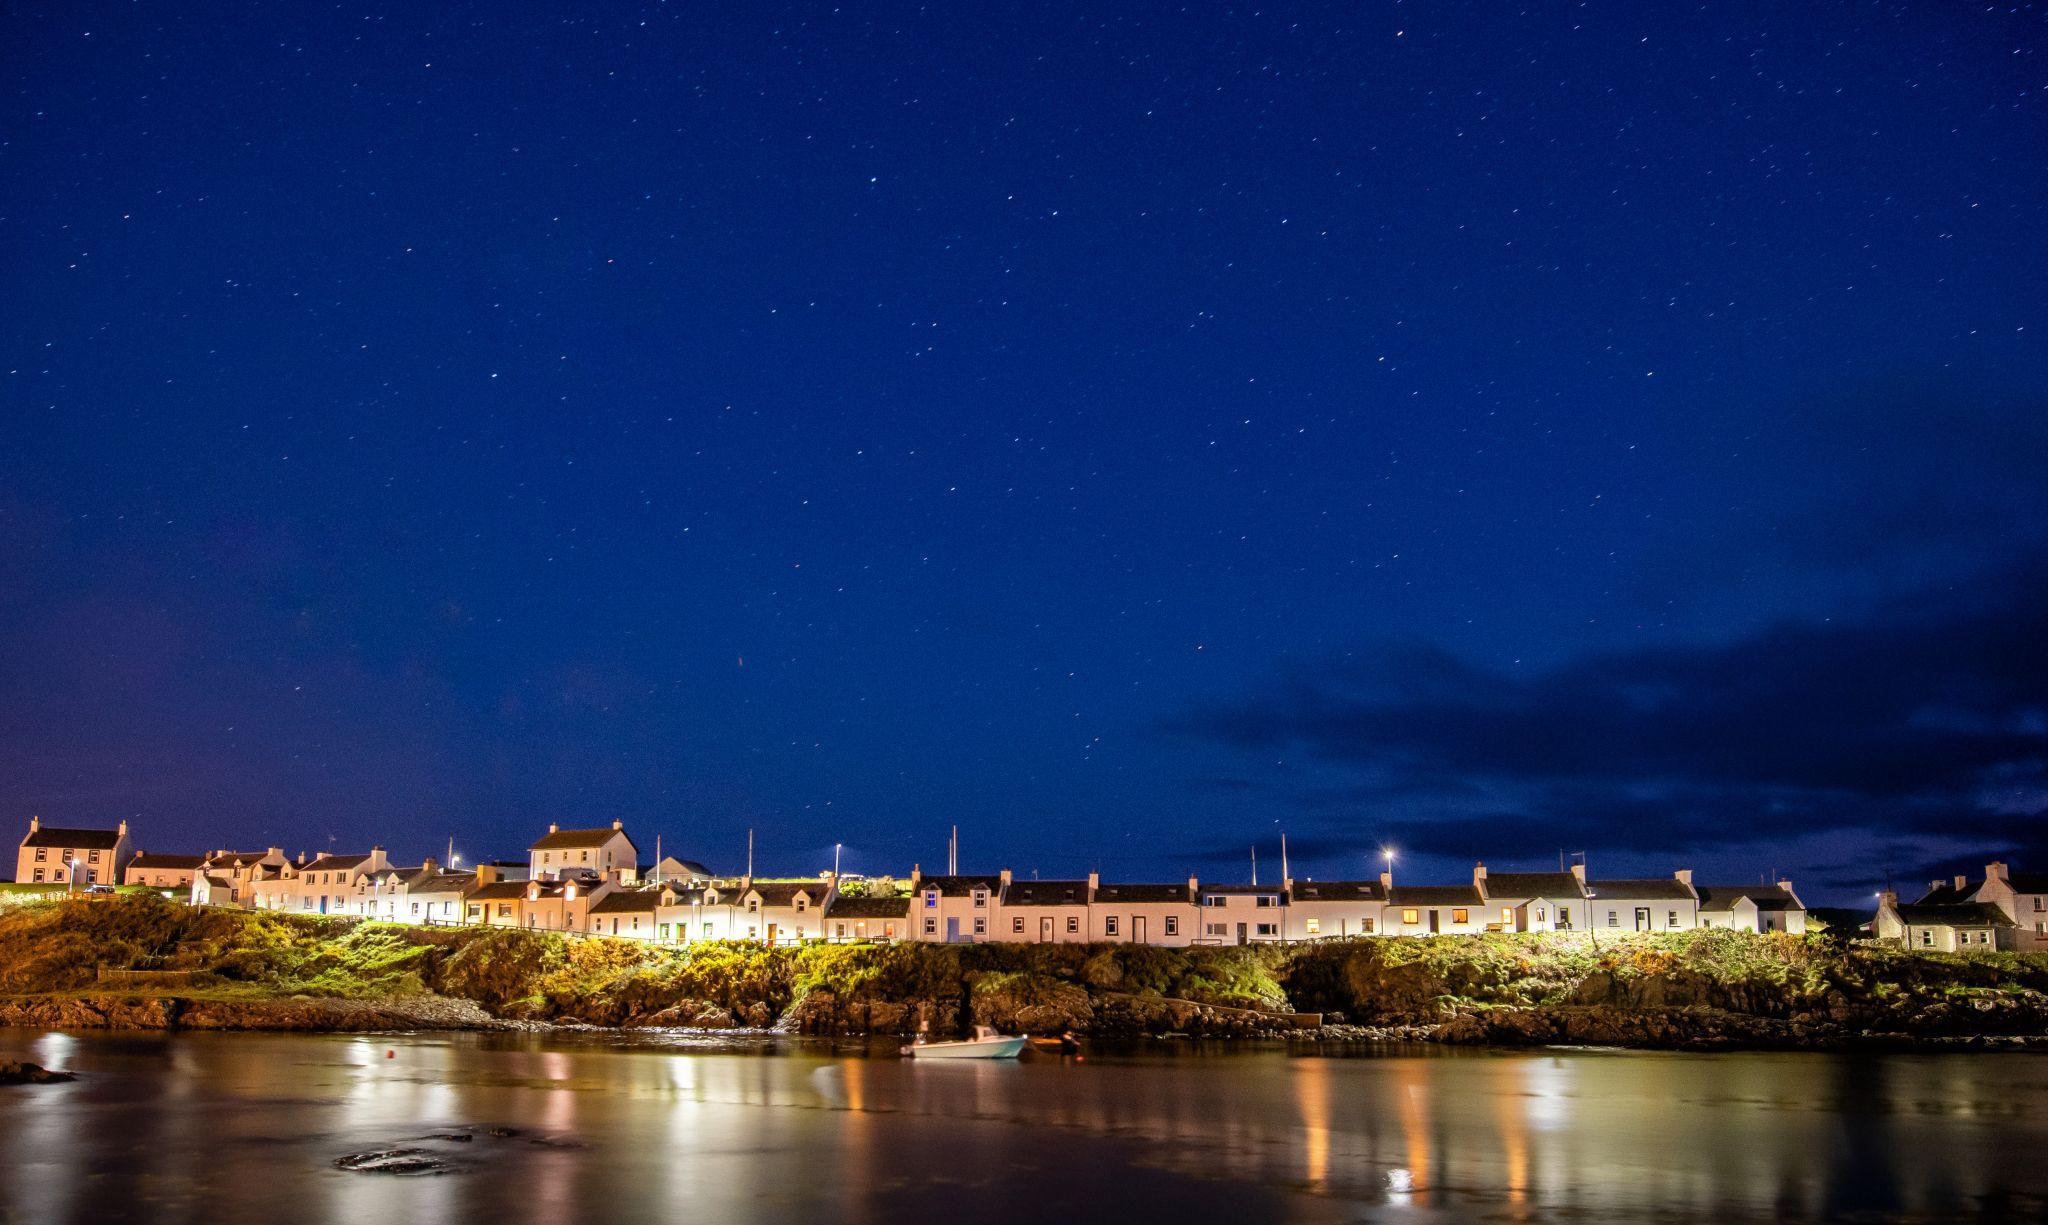 Portnaven on the Isle of Islay at night, United Kingdom